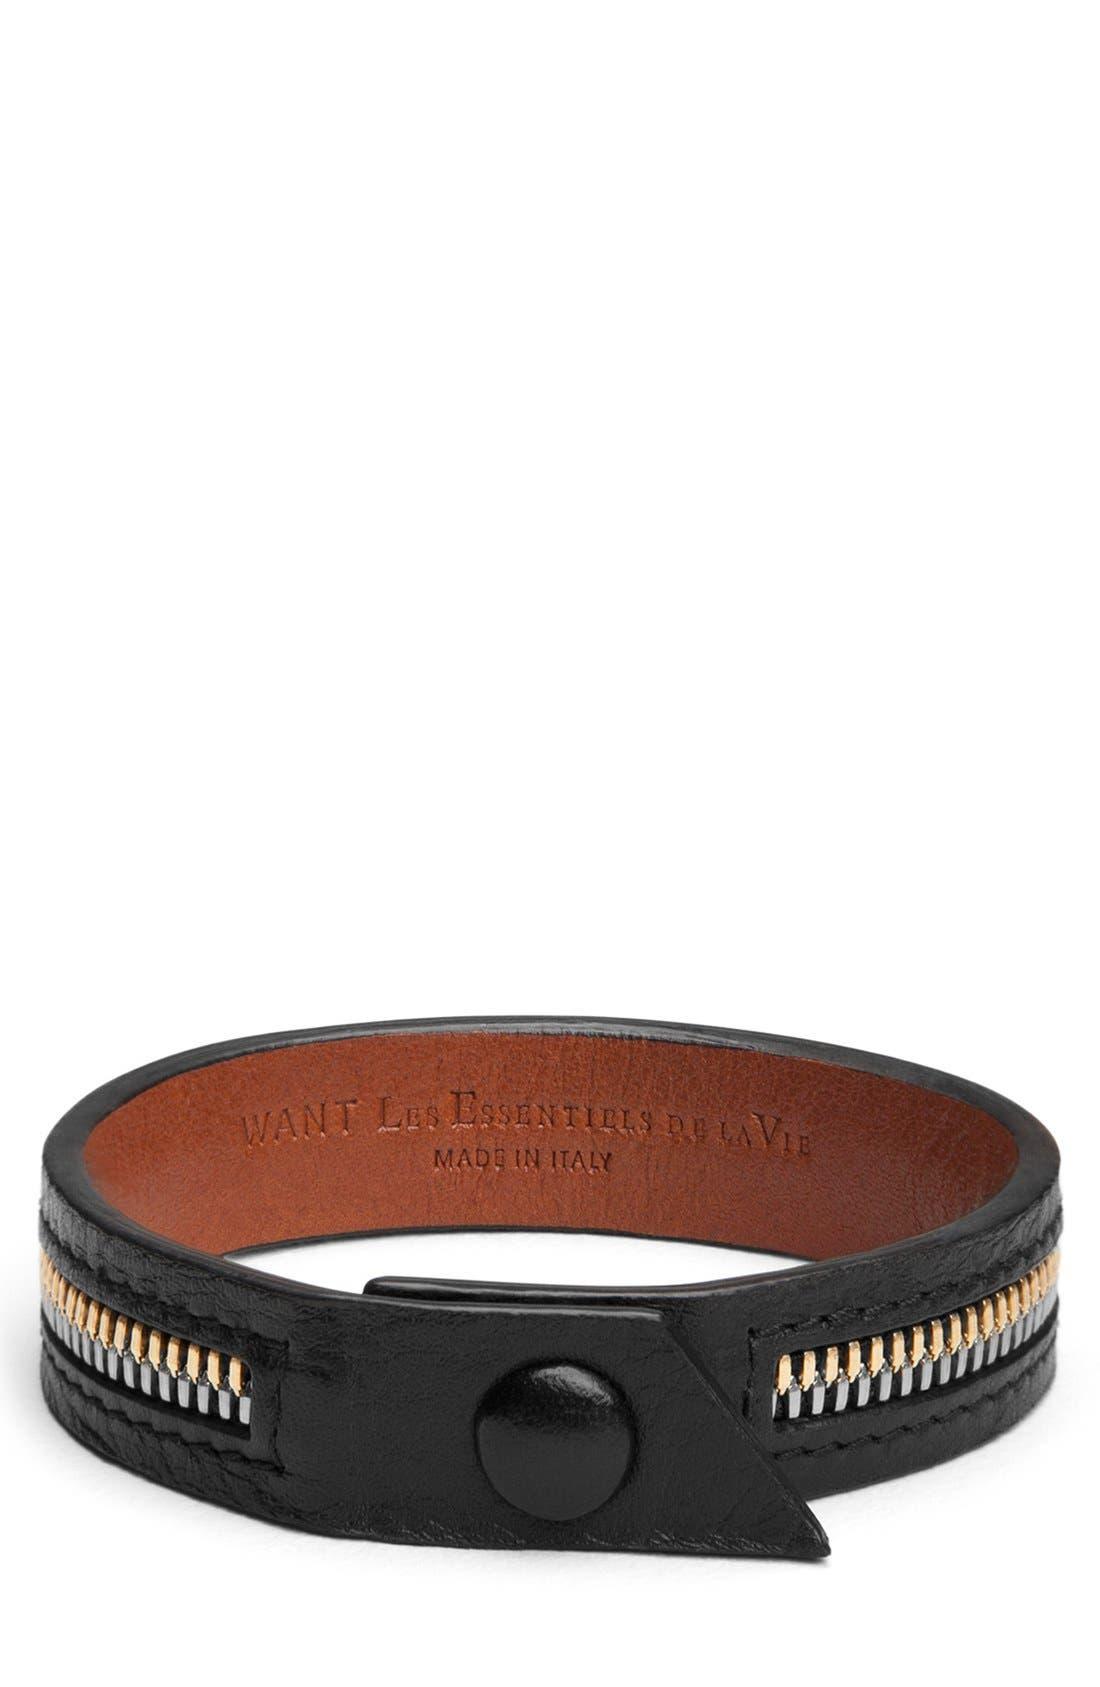 Tambo Zip Bracelet,                             Main thumbnail 1, color,                             010